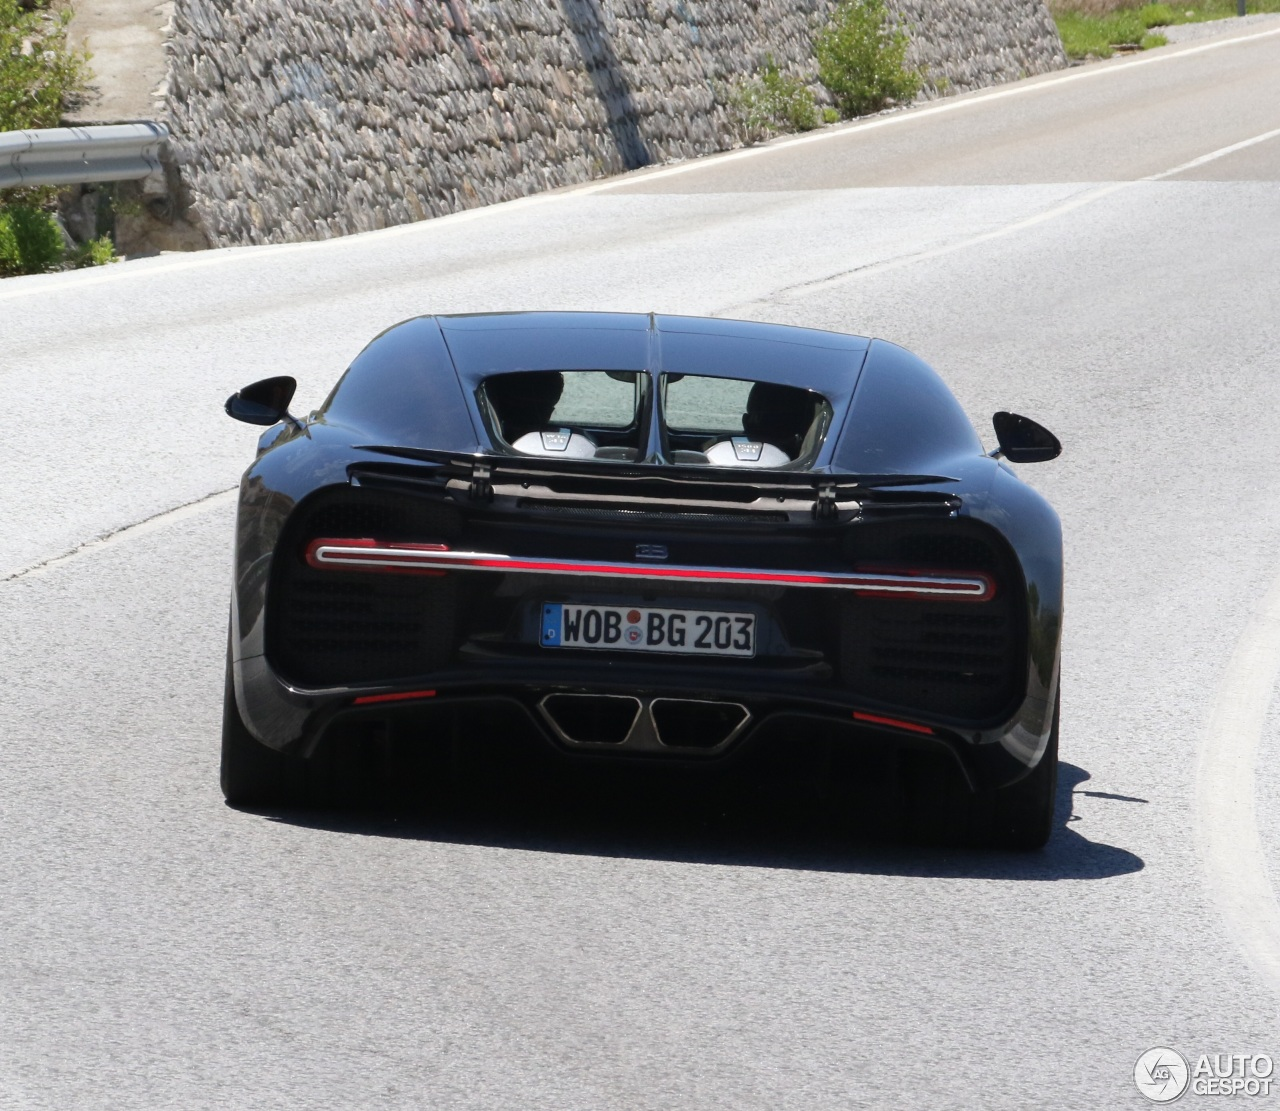 2016 Geneva Motor Show Bugatti Chiron First Look: Bugatti Chiron